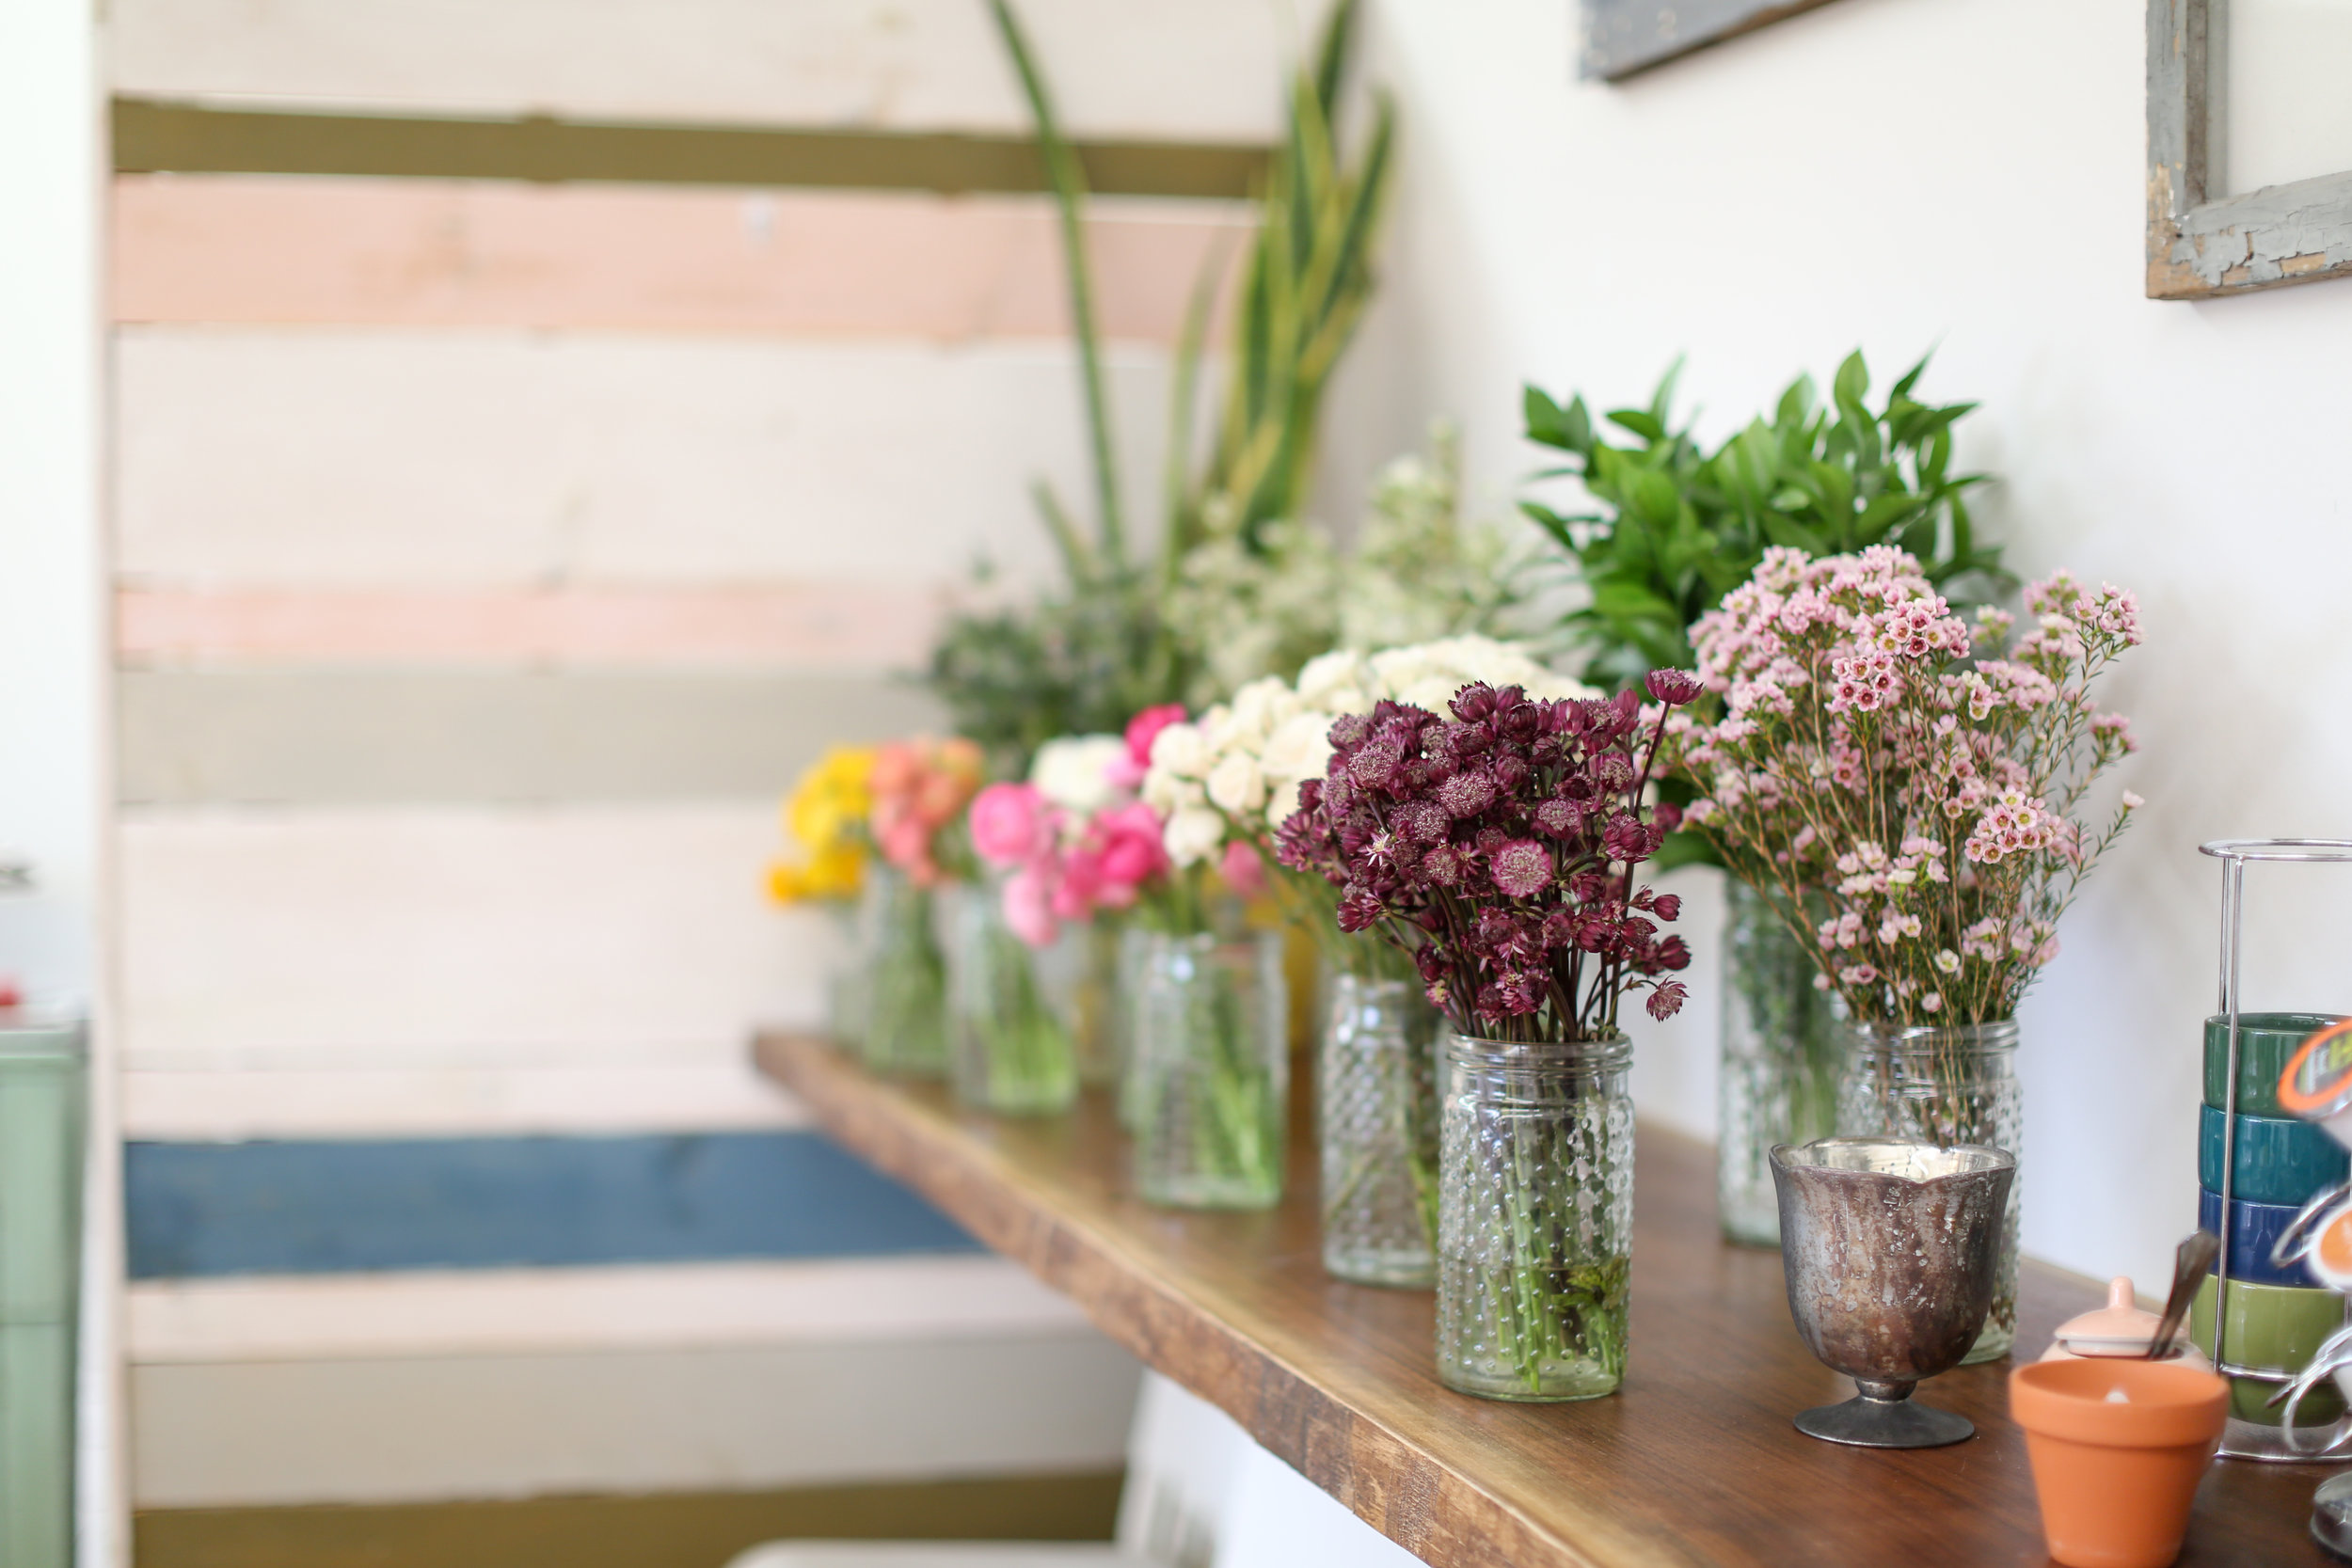 Bridal shower ideas, florist for weddings, bridal shower ideas, bucks county wedding